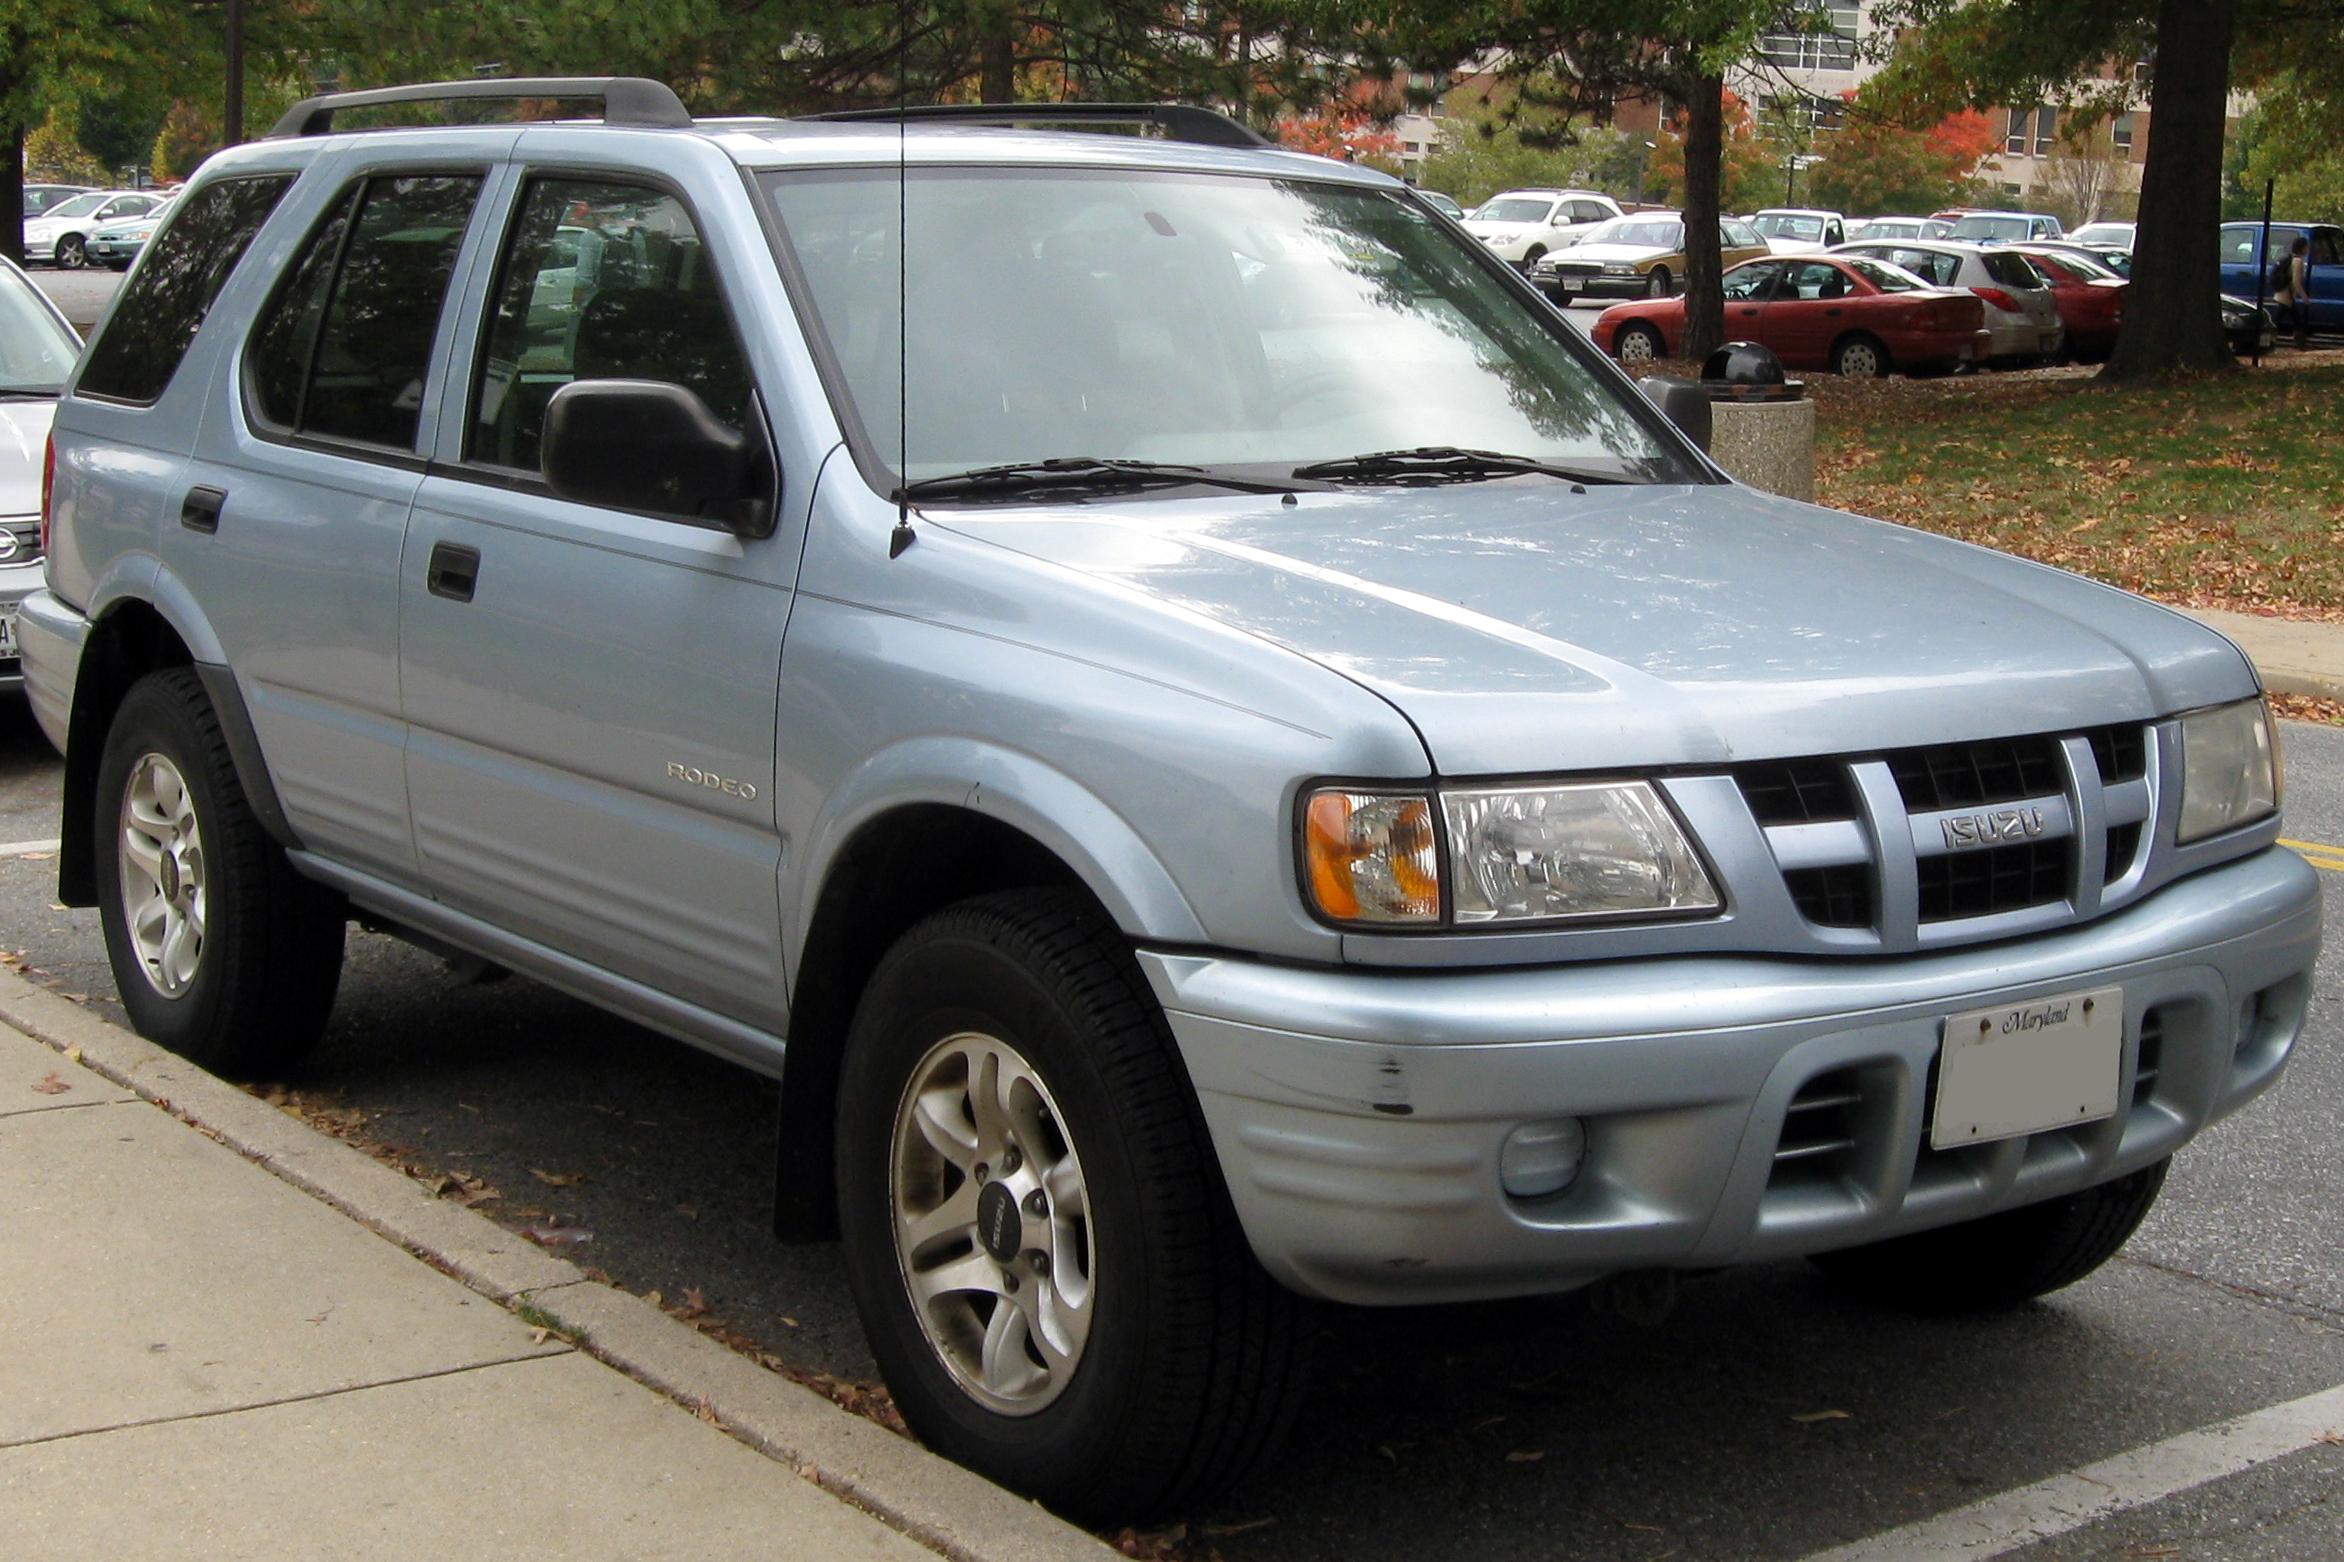 Isuzu Rodeo II 1998 - 2004 SUV #1